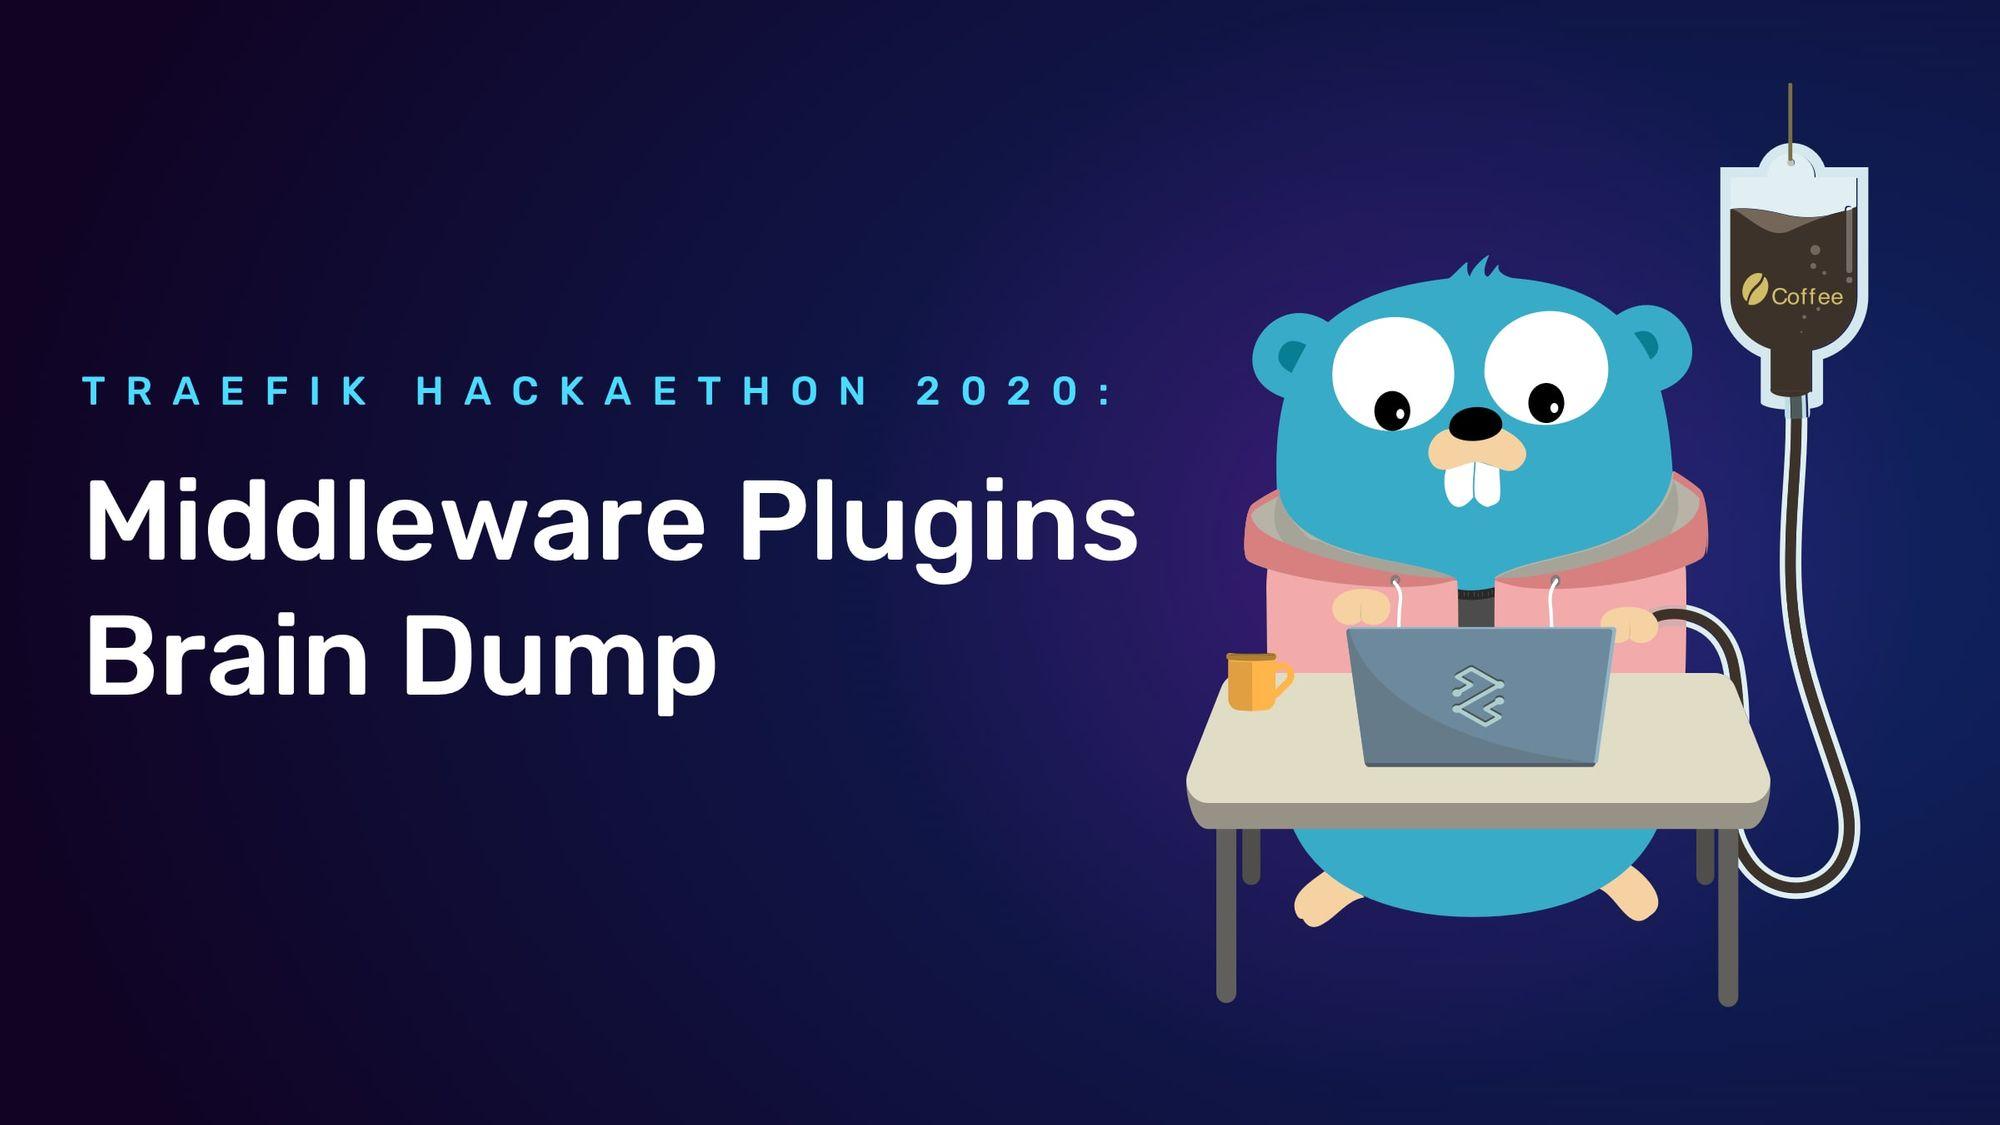 Traefik Hackaethon 2020: Middleware Plugins Brain Dump